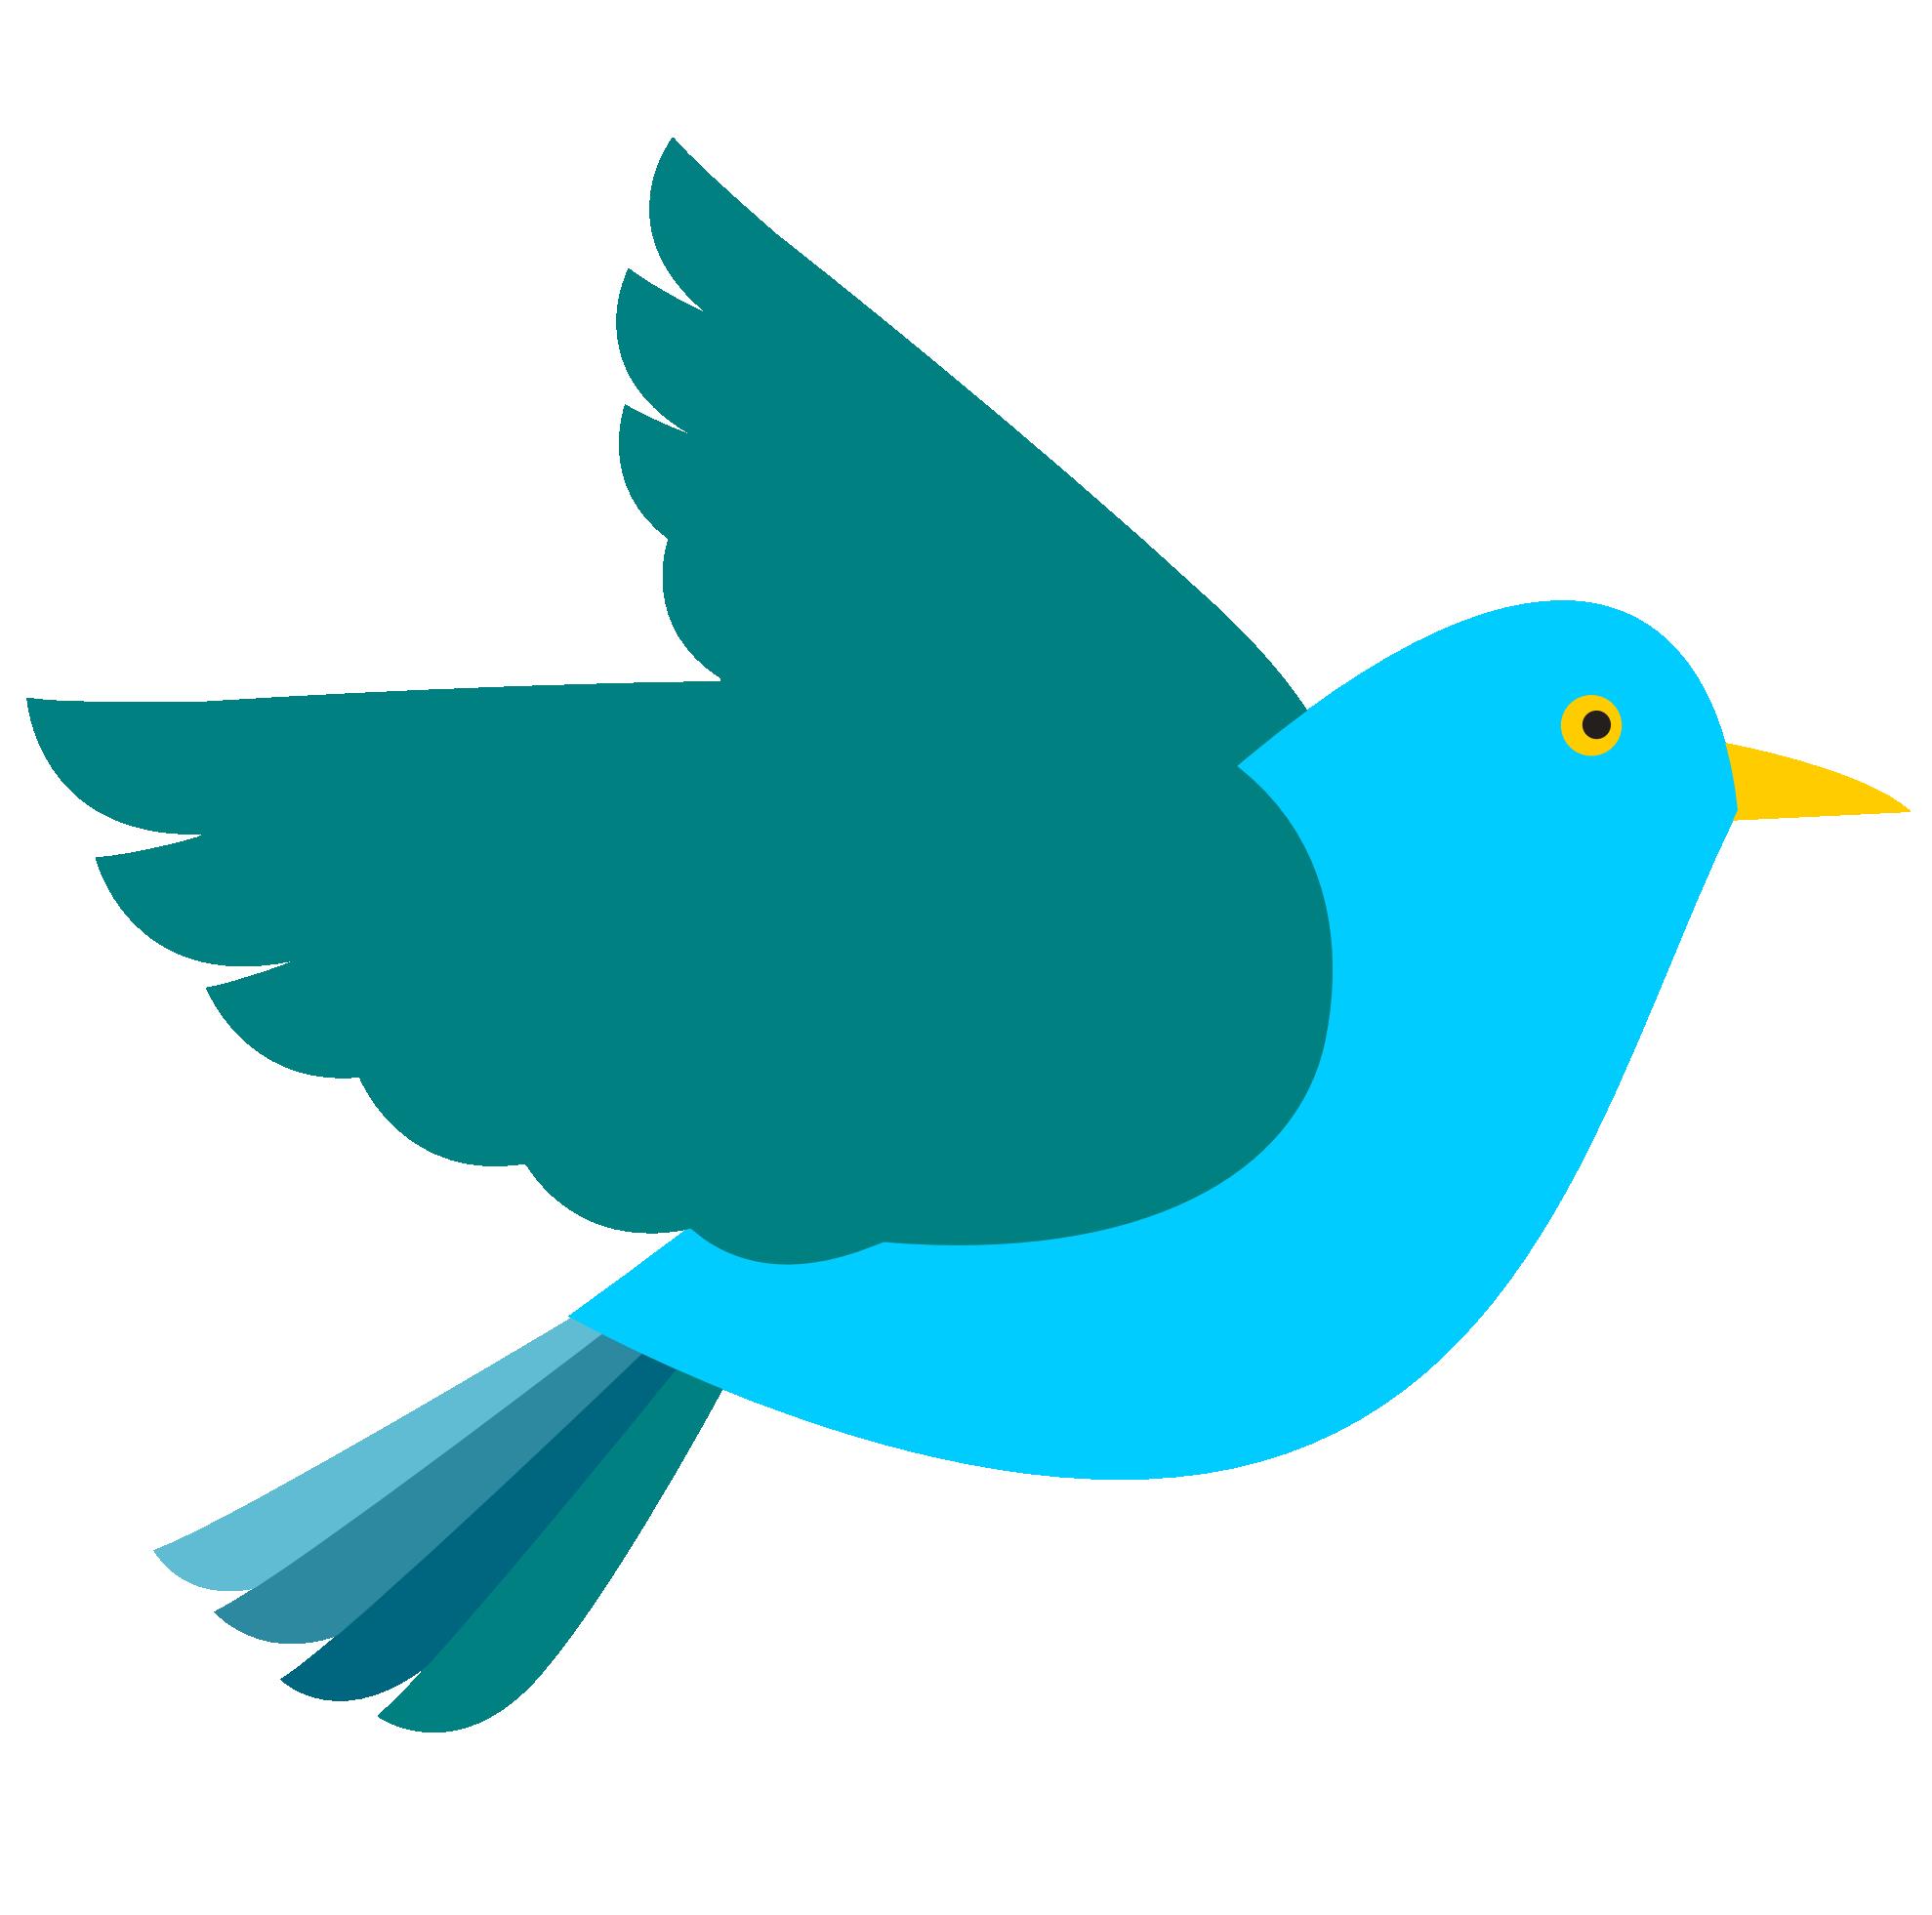 Bird clipart transparent background 3 » Clipart Station.